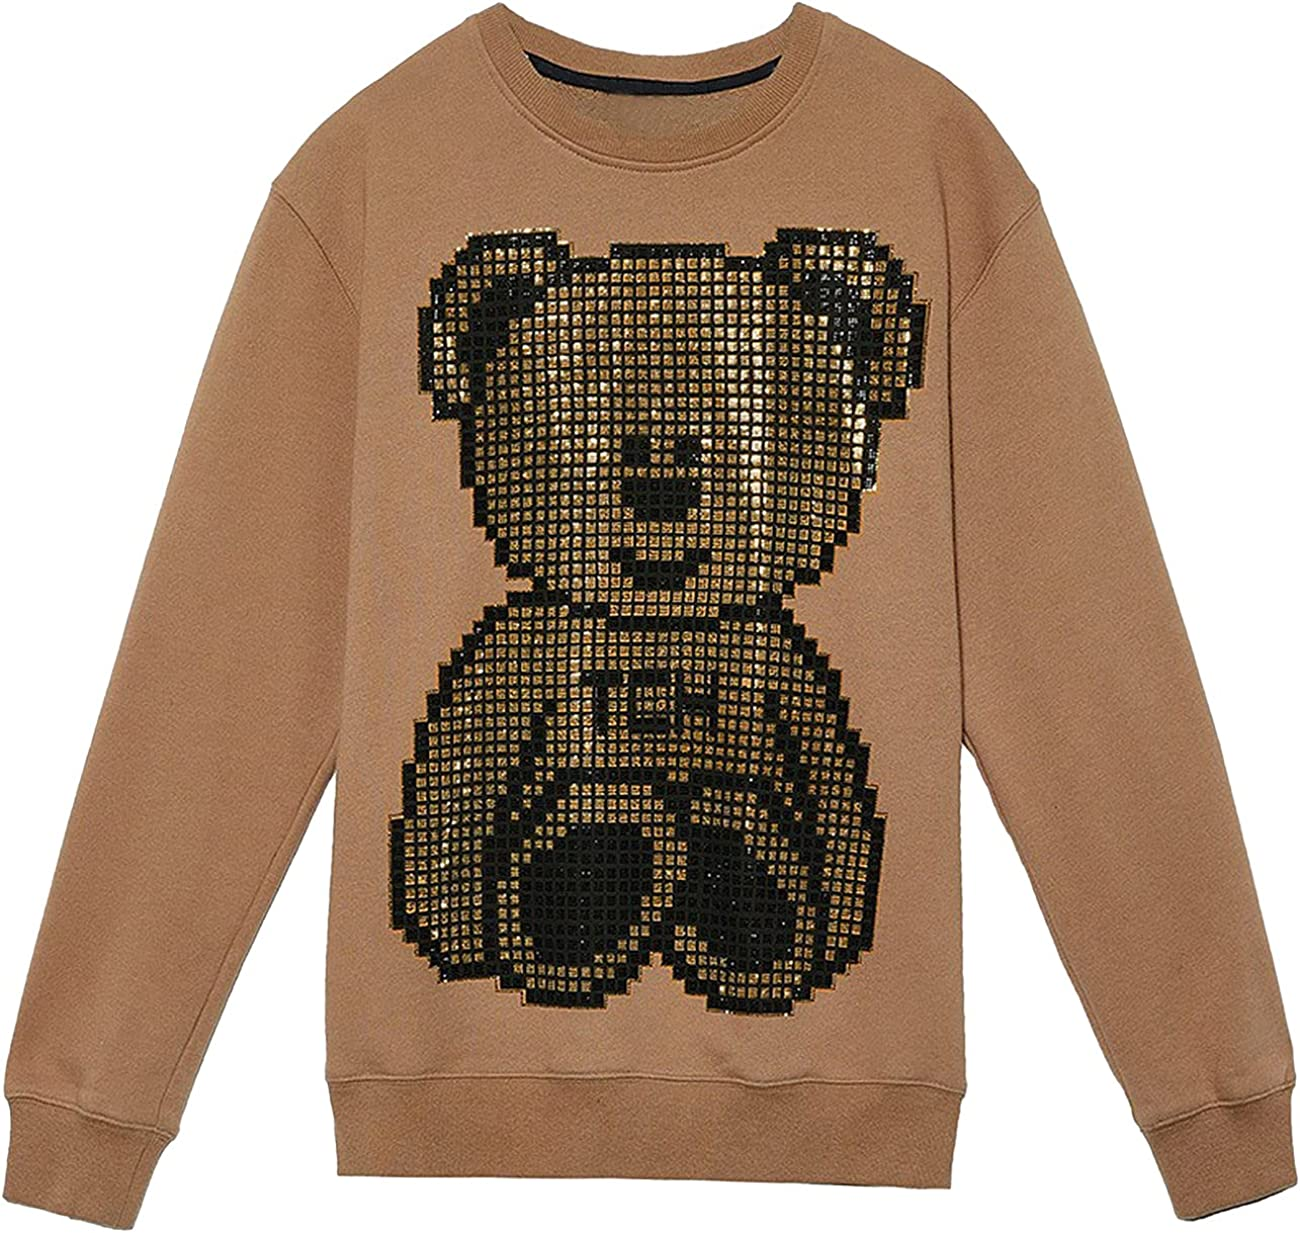 F/F·X Letter Bear Khaki Crew Neck Sweatshirt Round-Neck t-Shirt